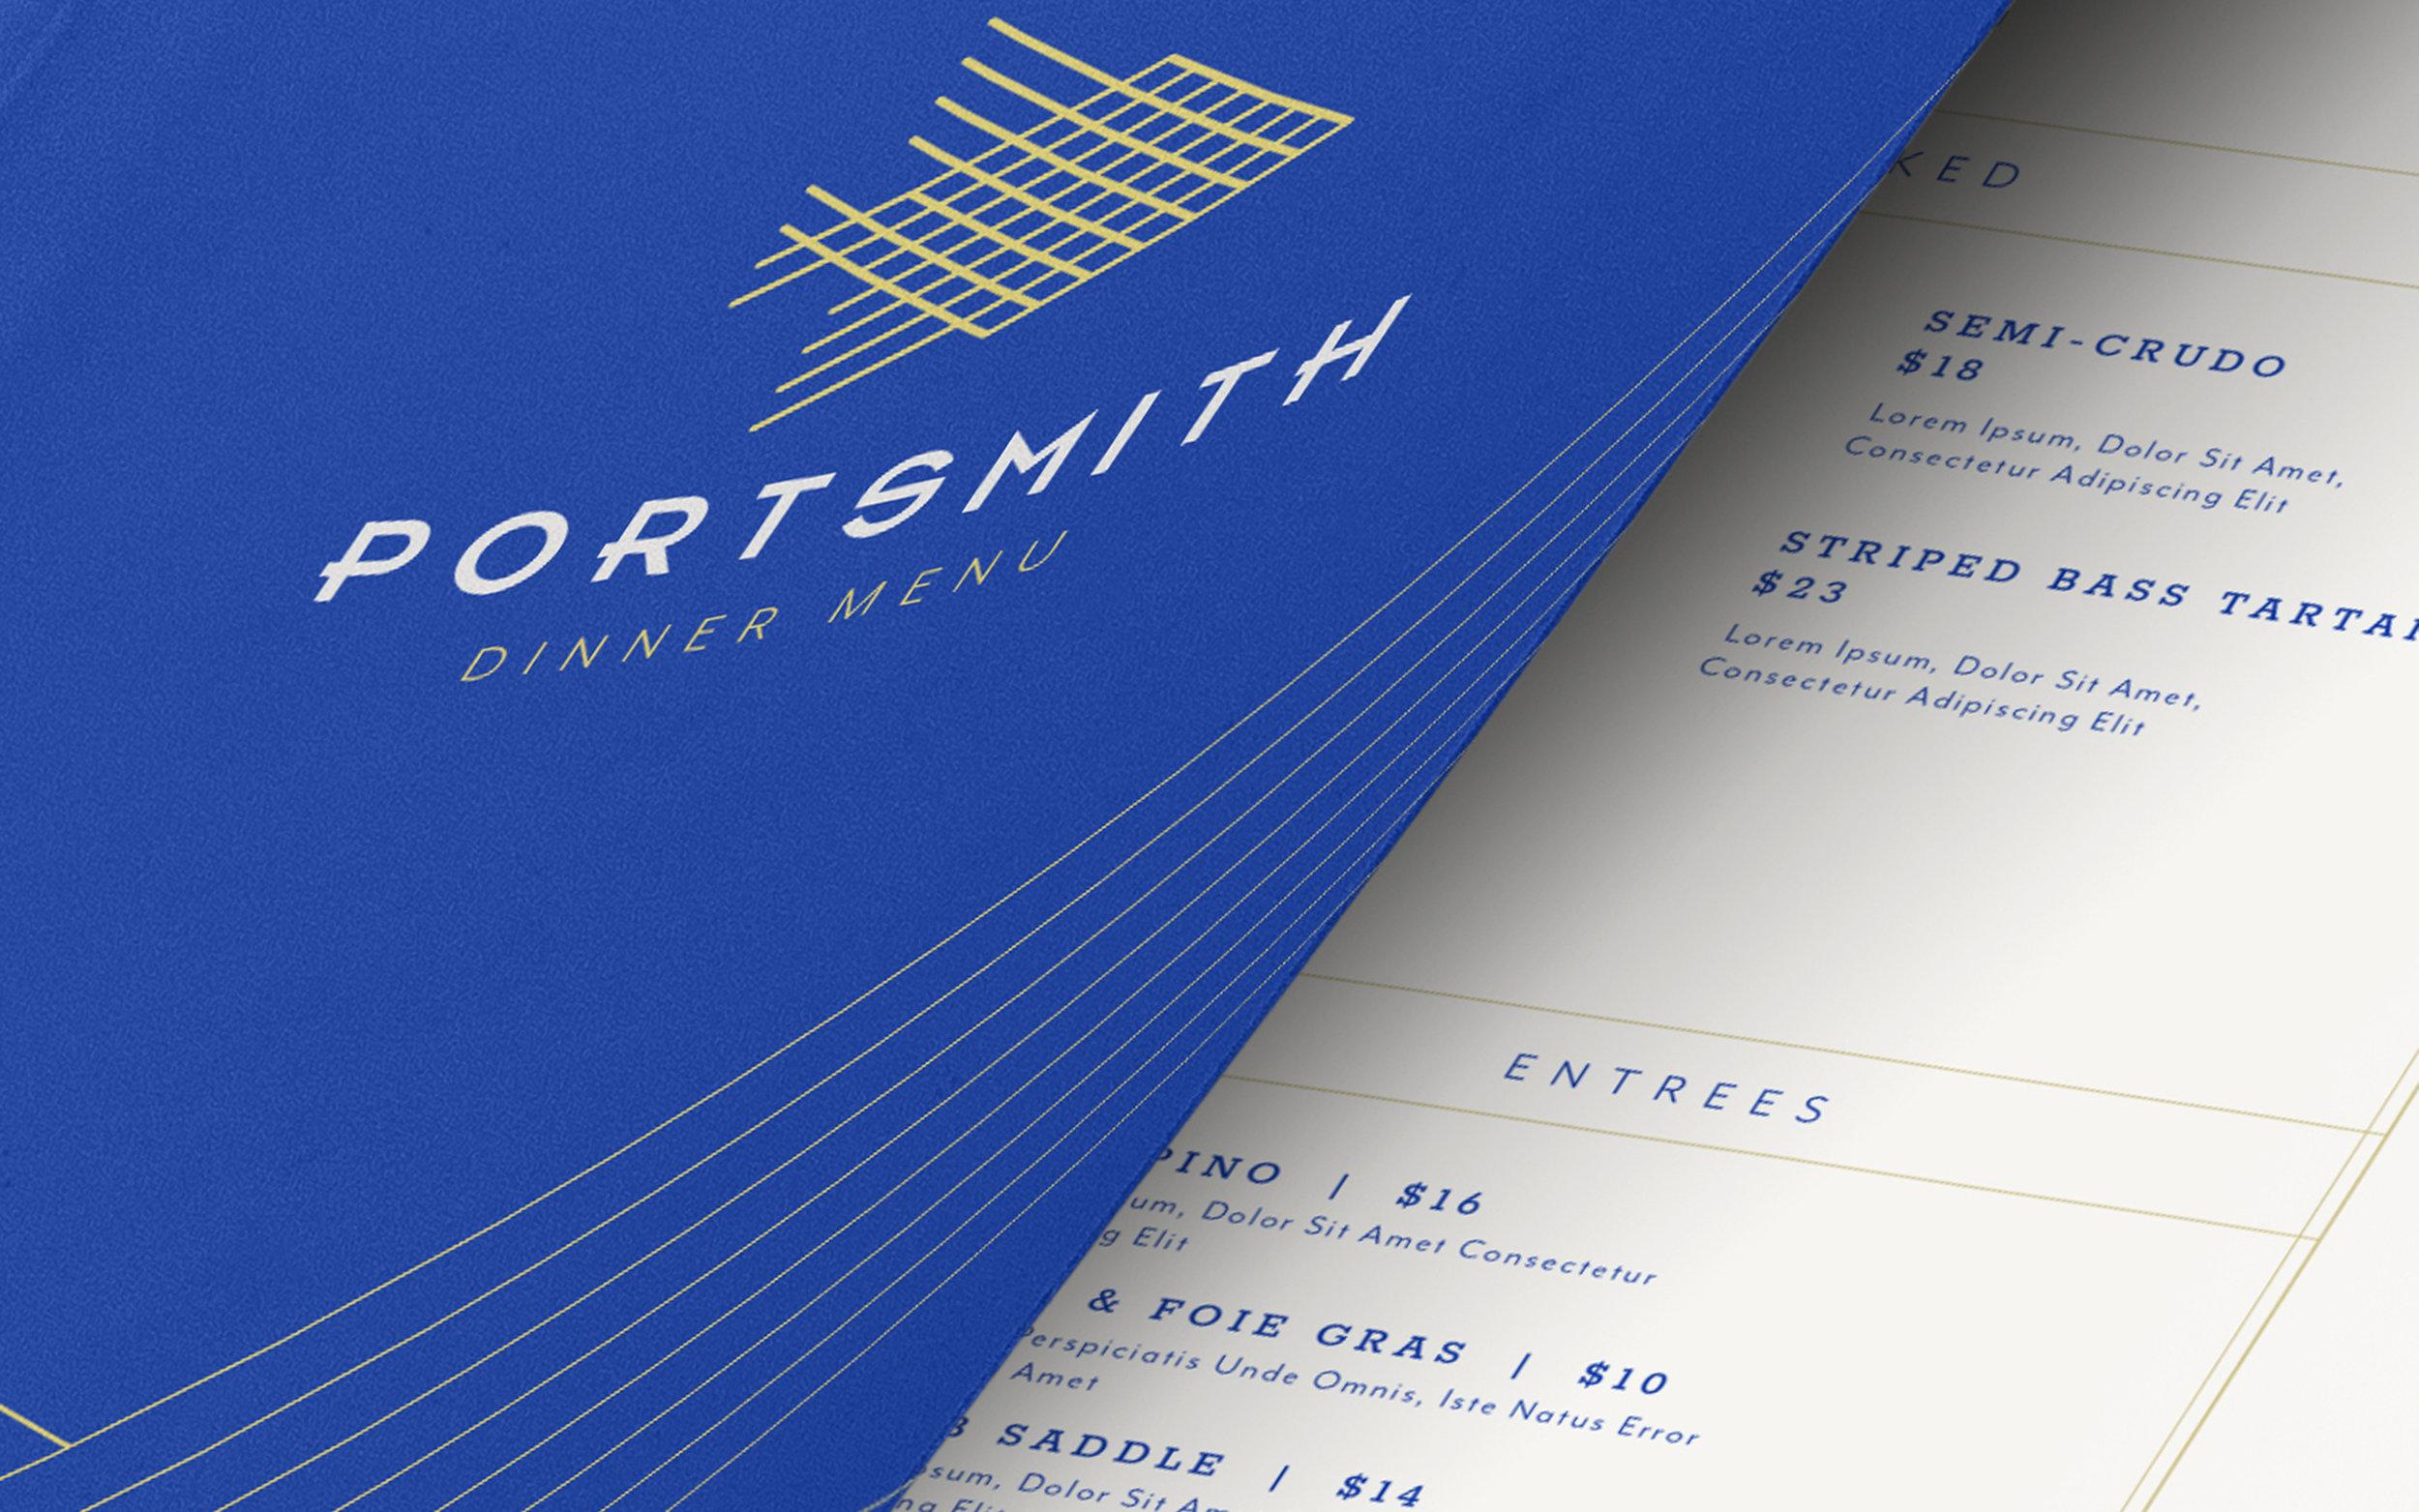 sorto-portsmith-menu-main.jpg